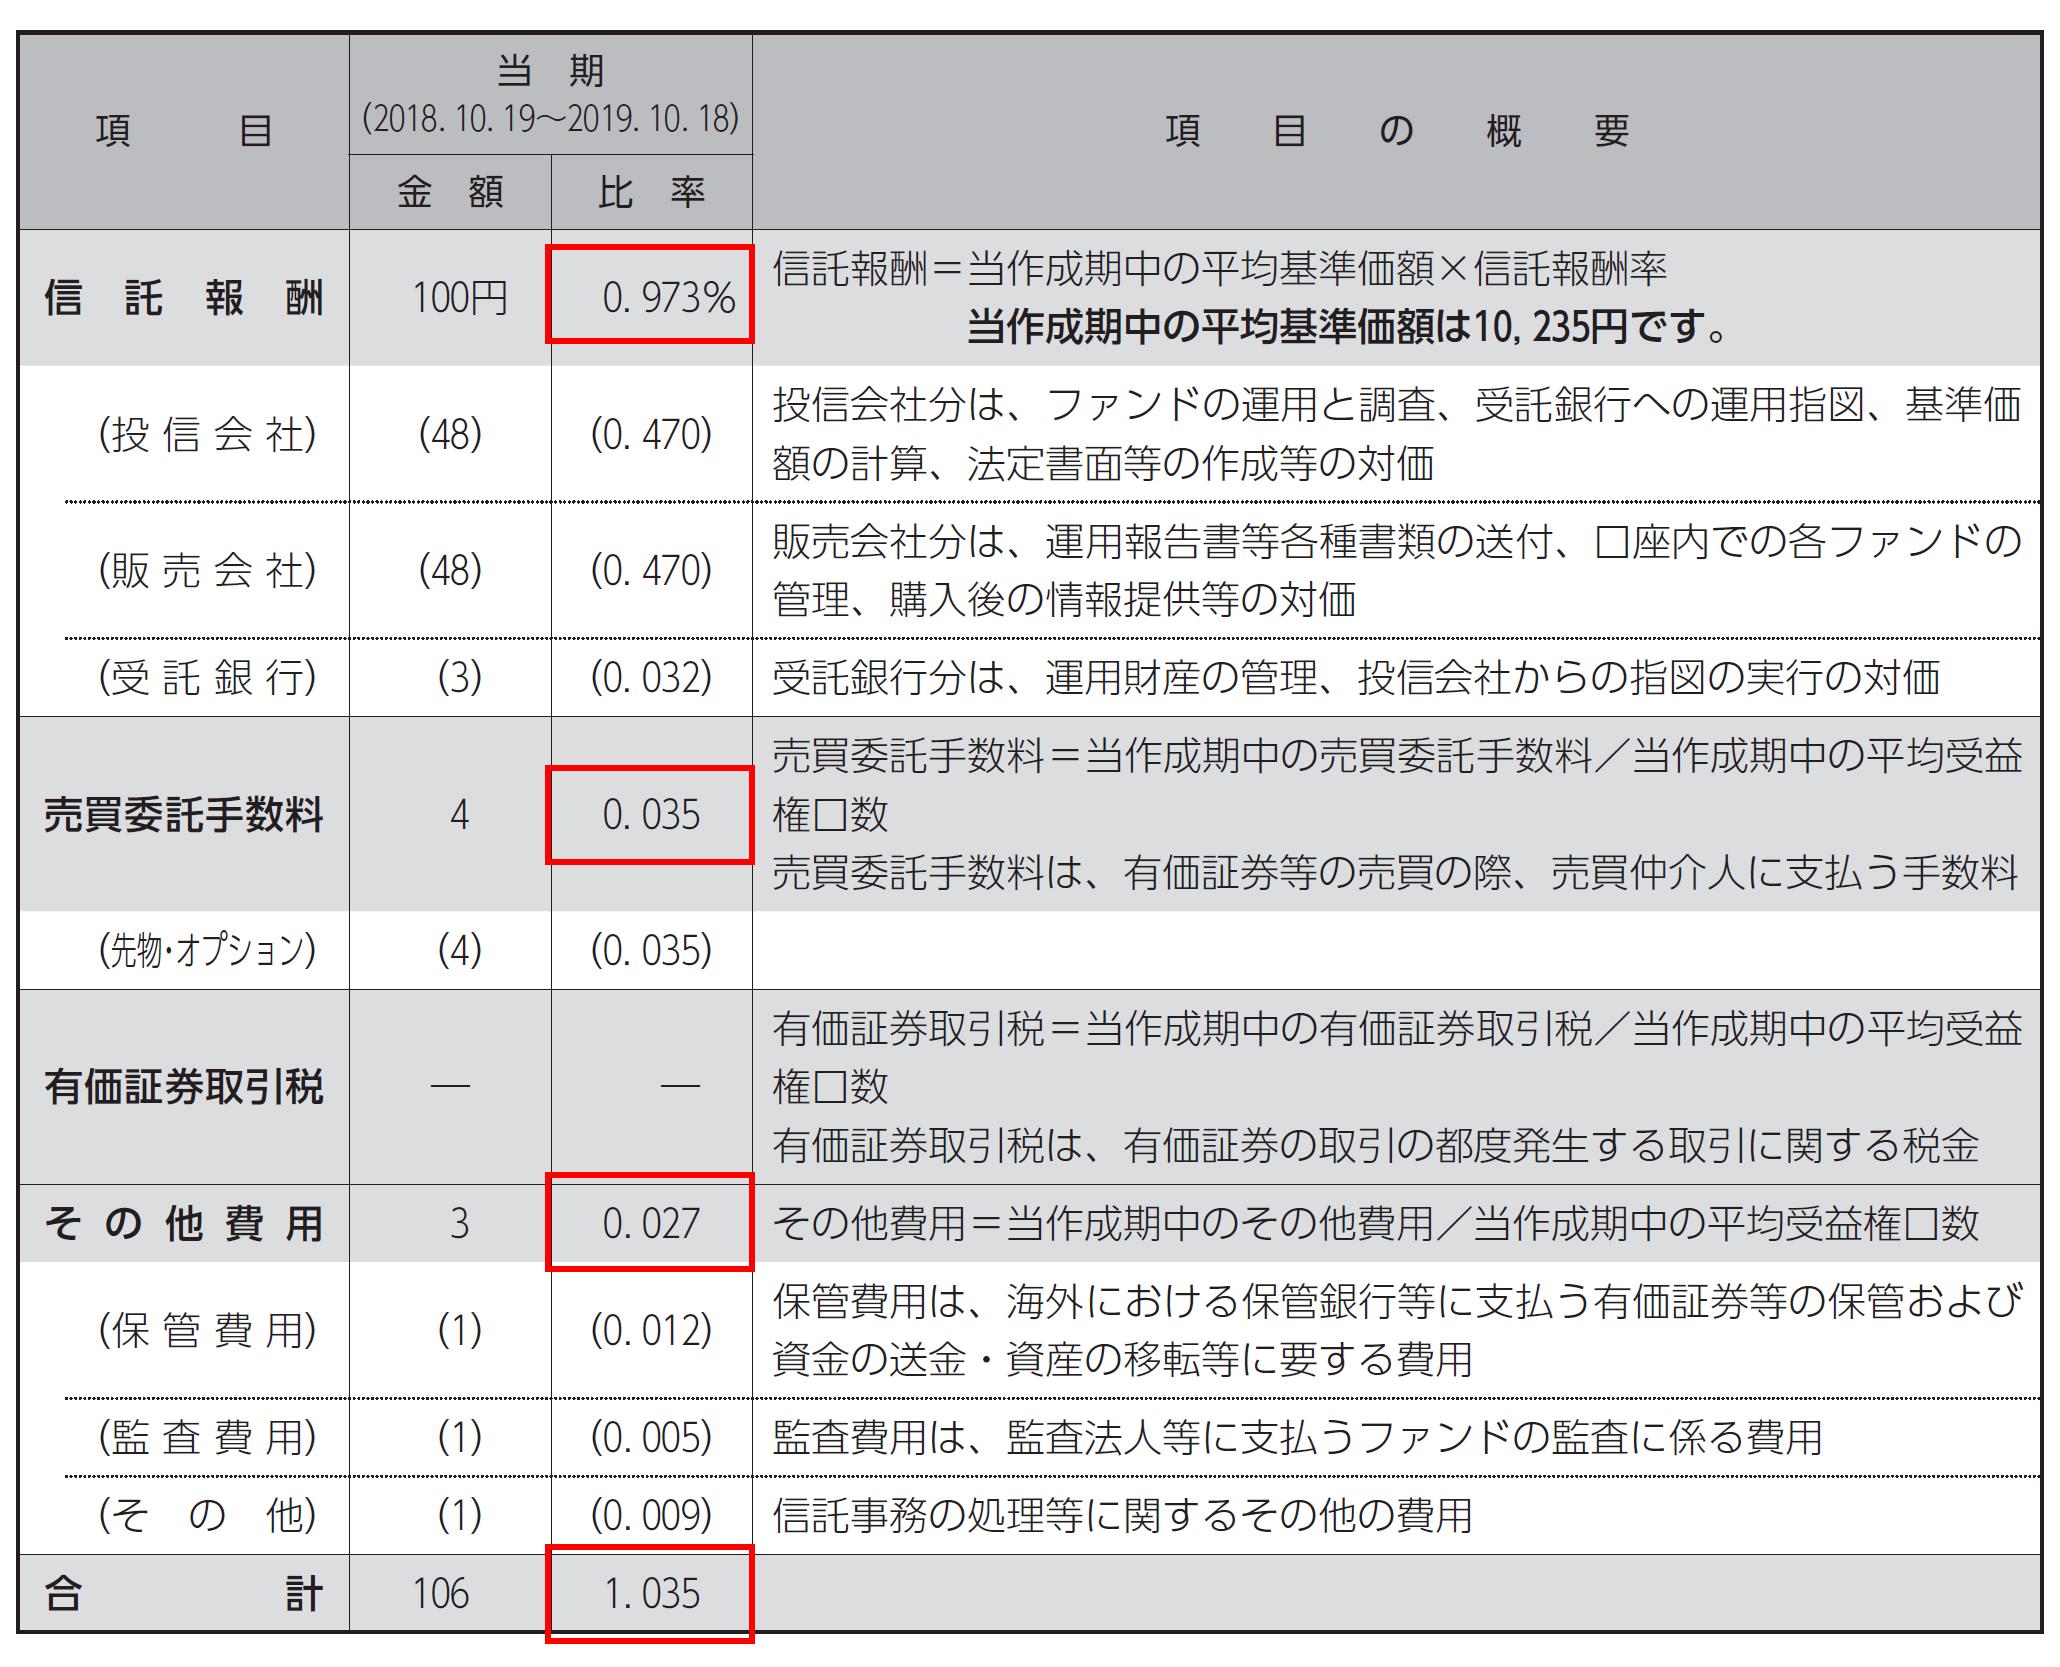 f:id:hodo-work:20201209204646p:plain